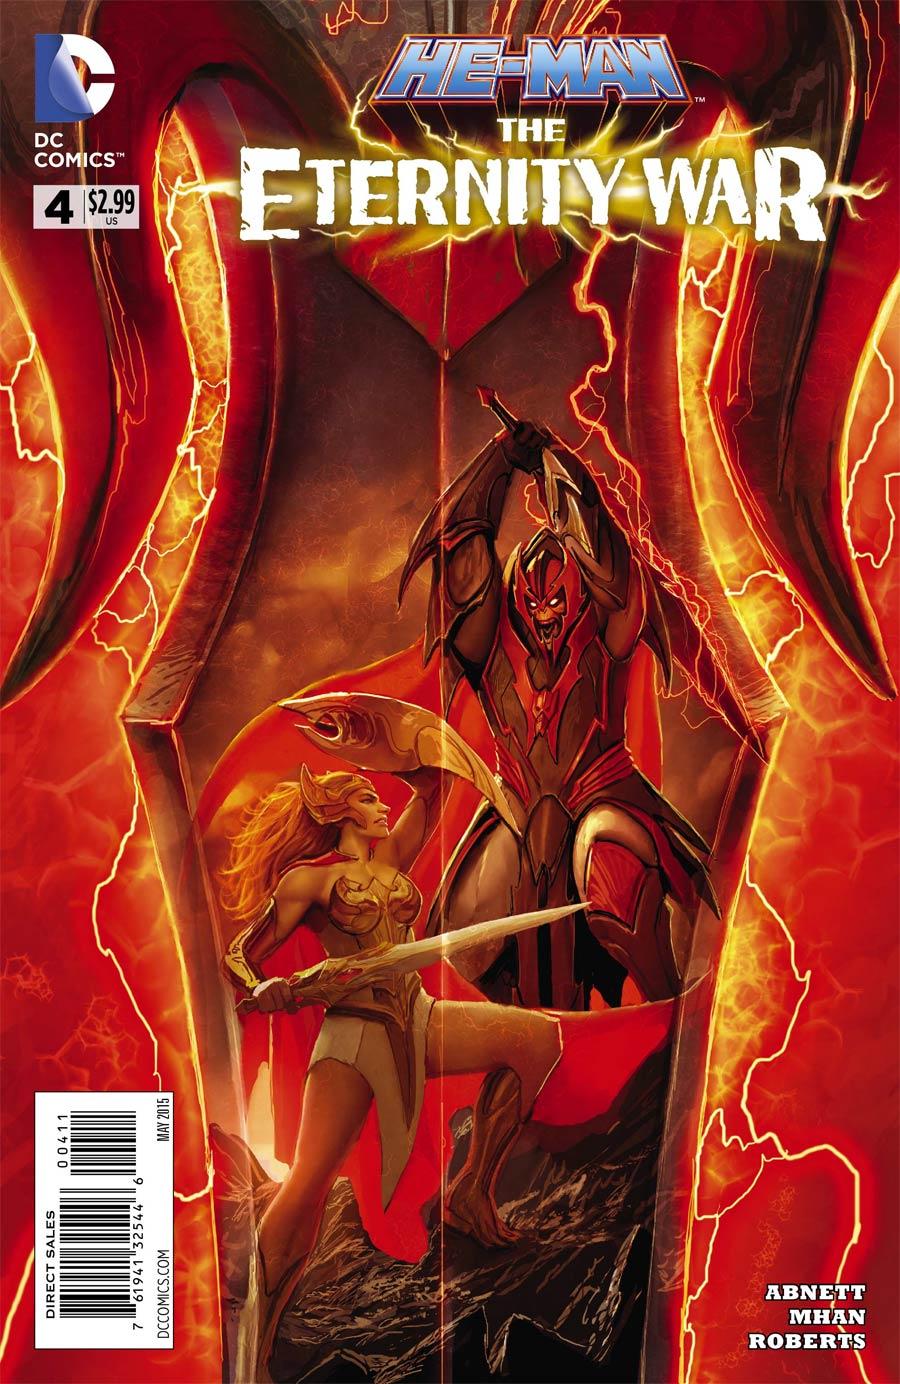 He-Man The Eternity War #4